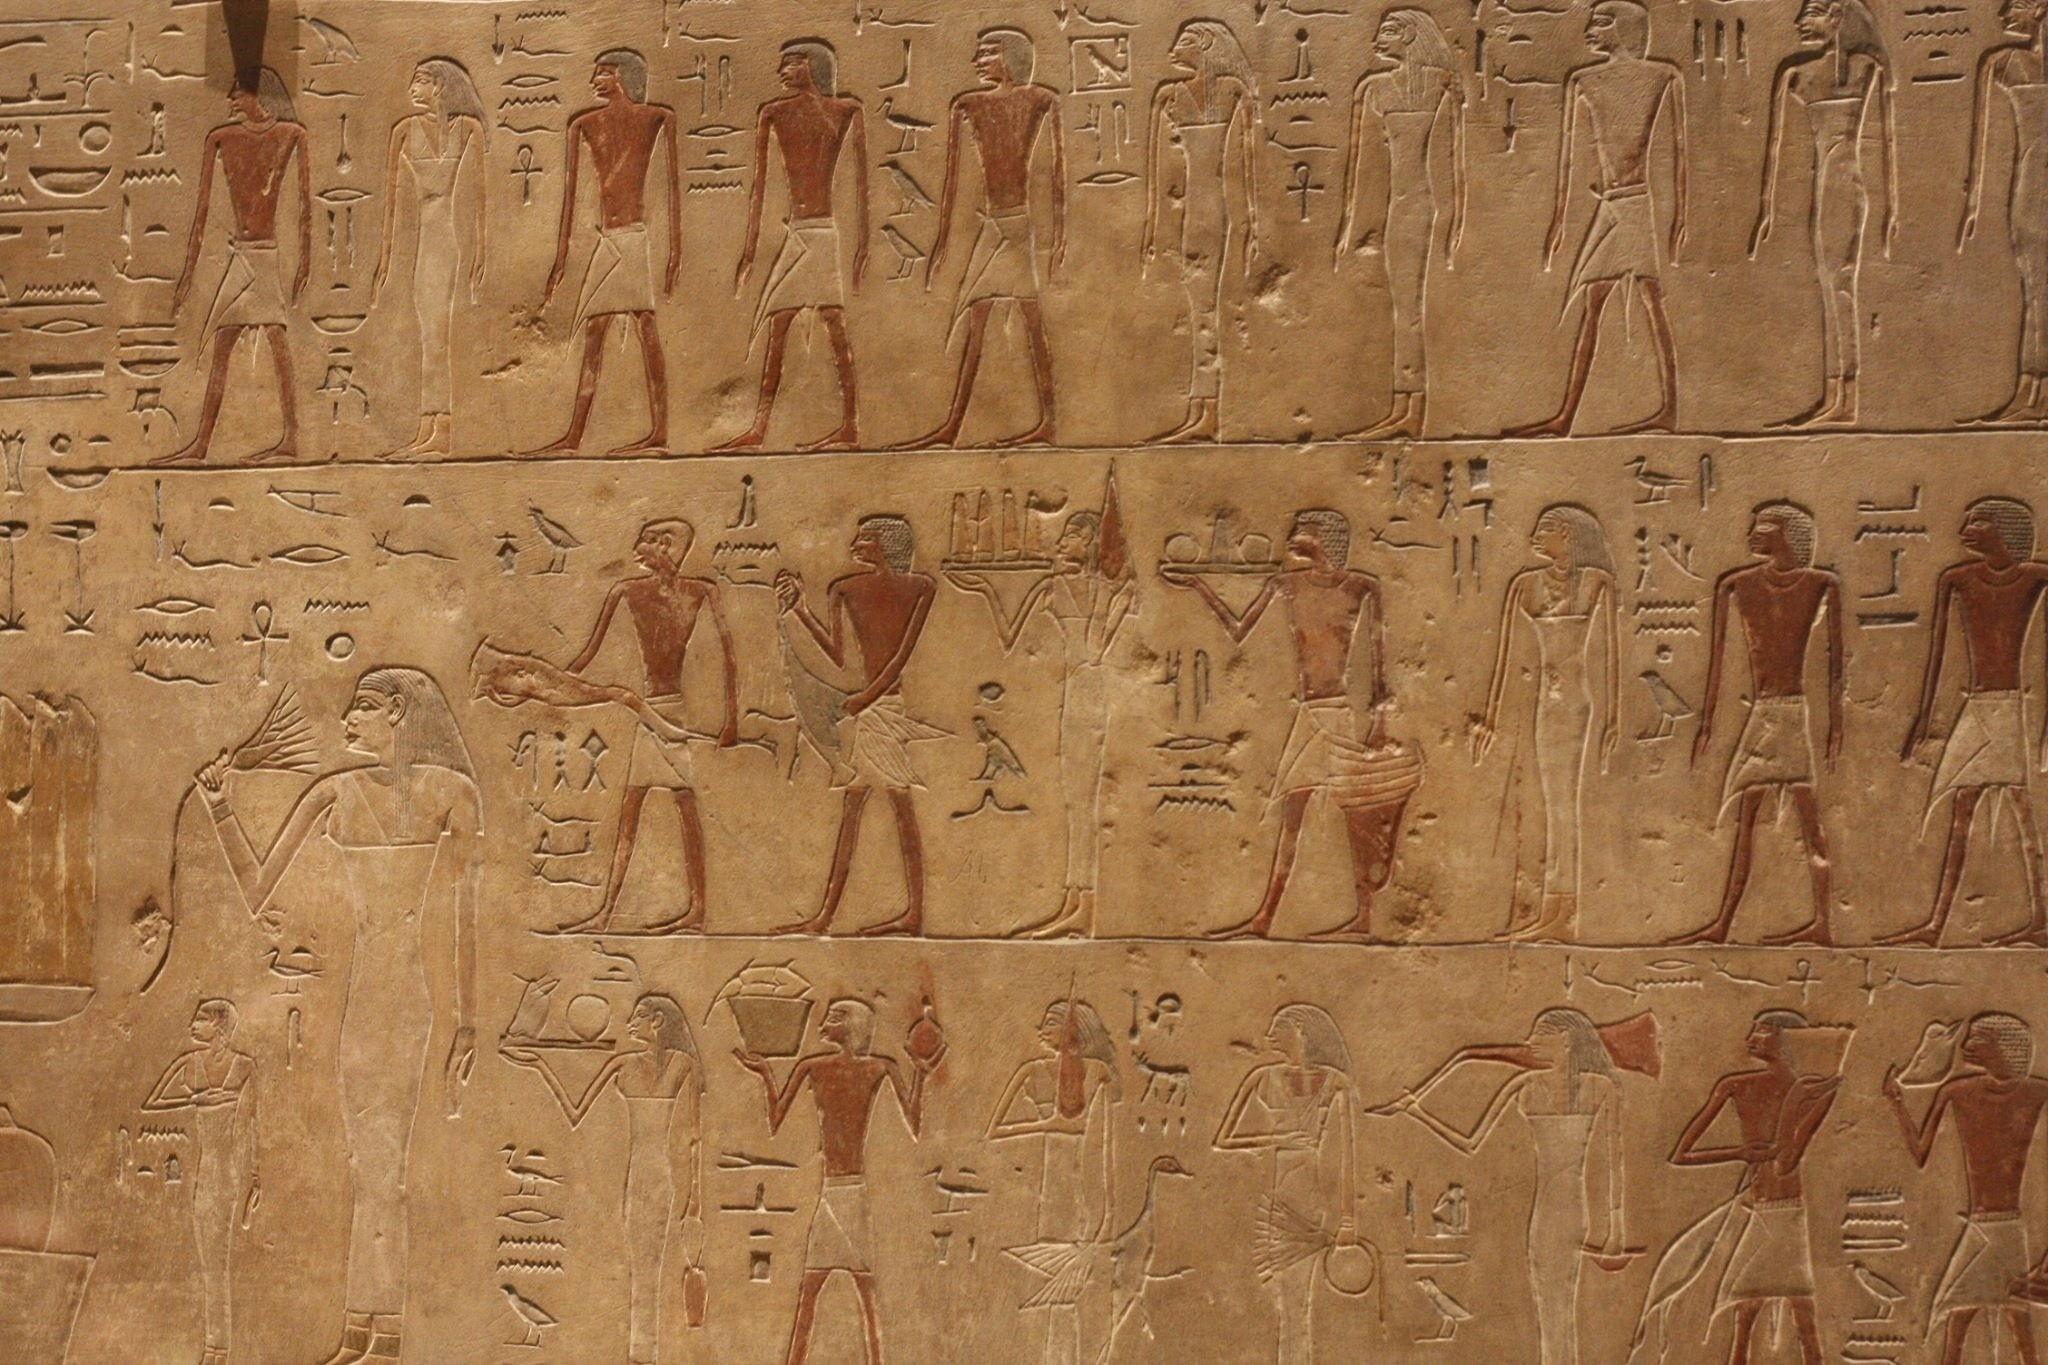 Cool Girl Wallpaper Free Download Egyptian Art Wallpaper 43 Images